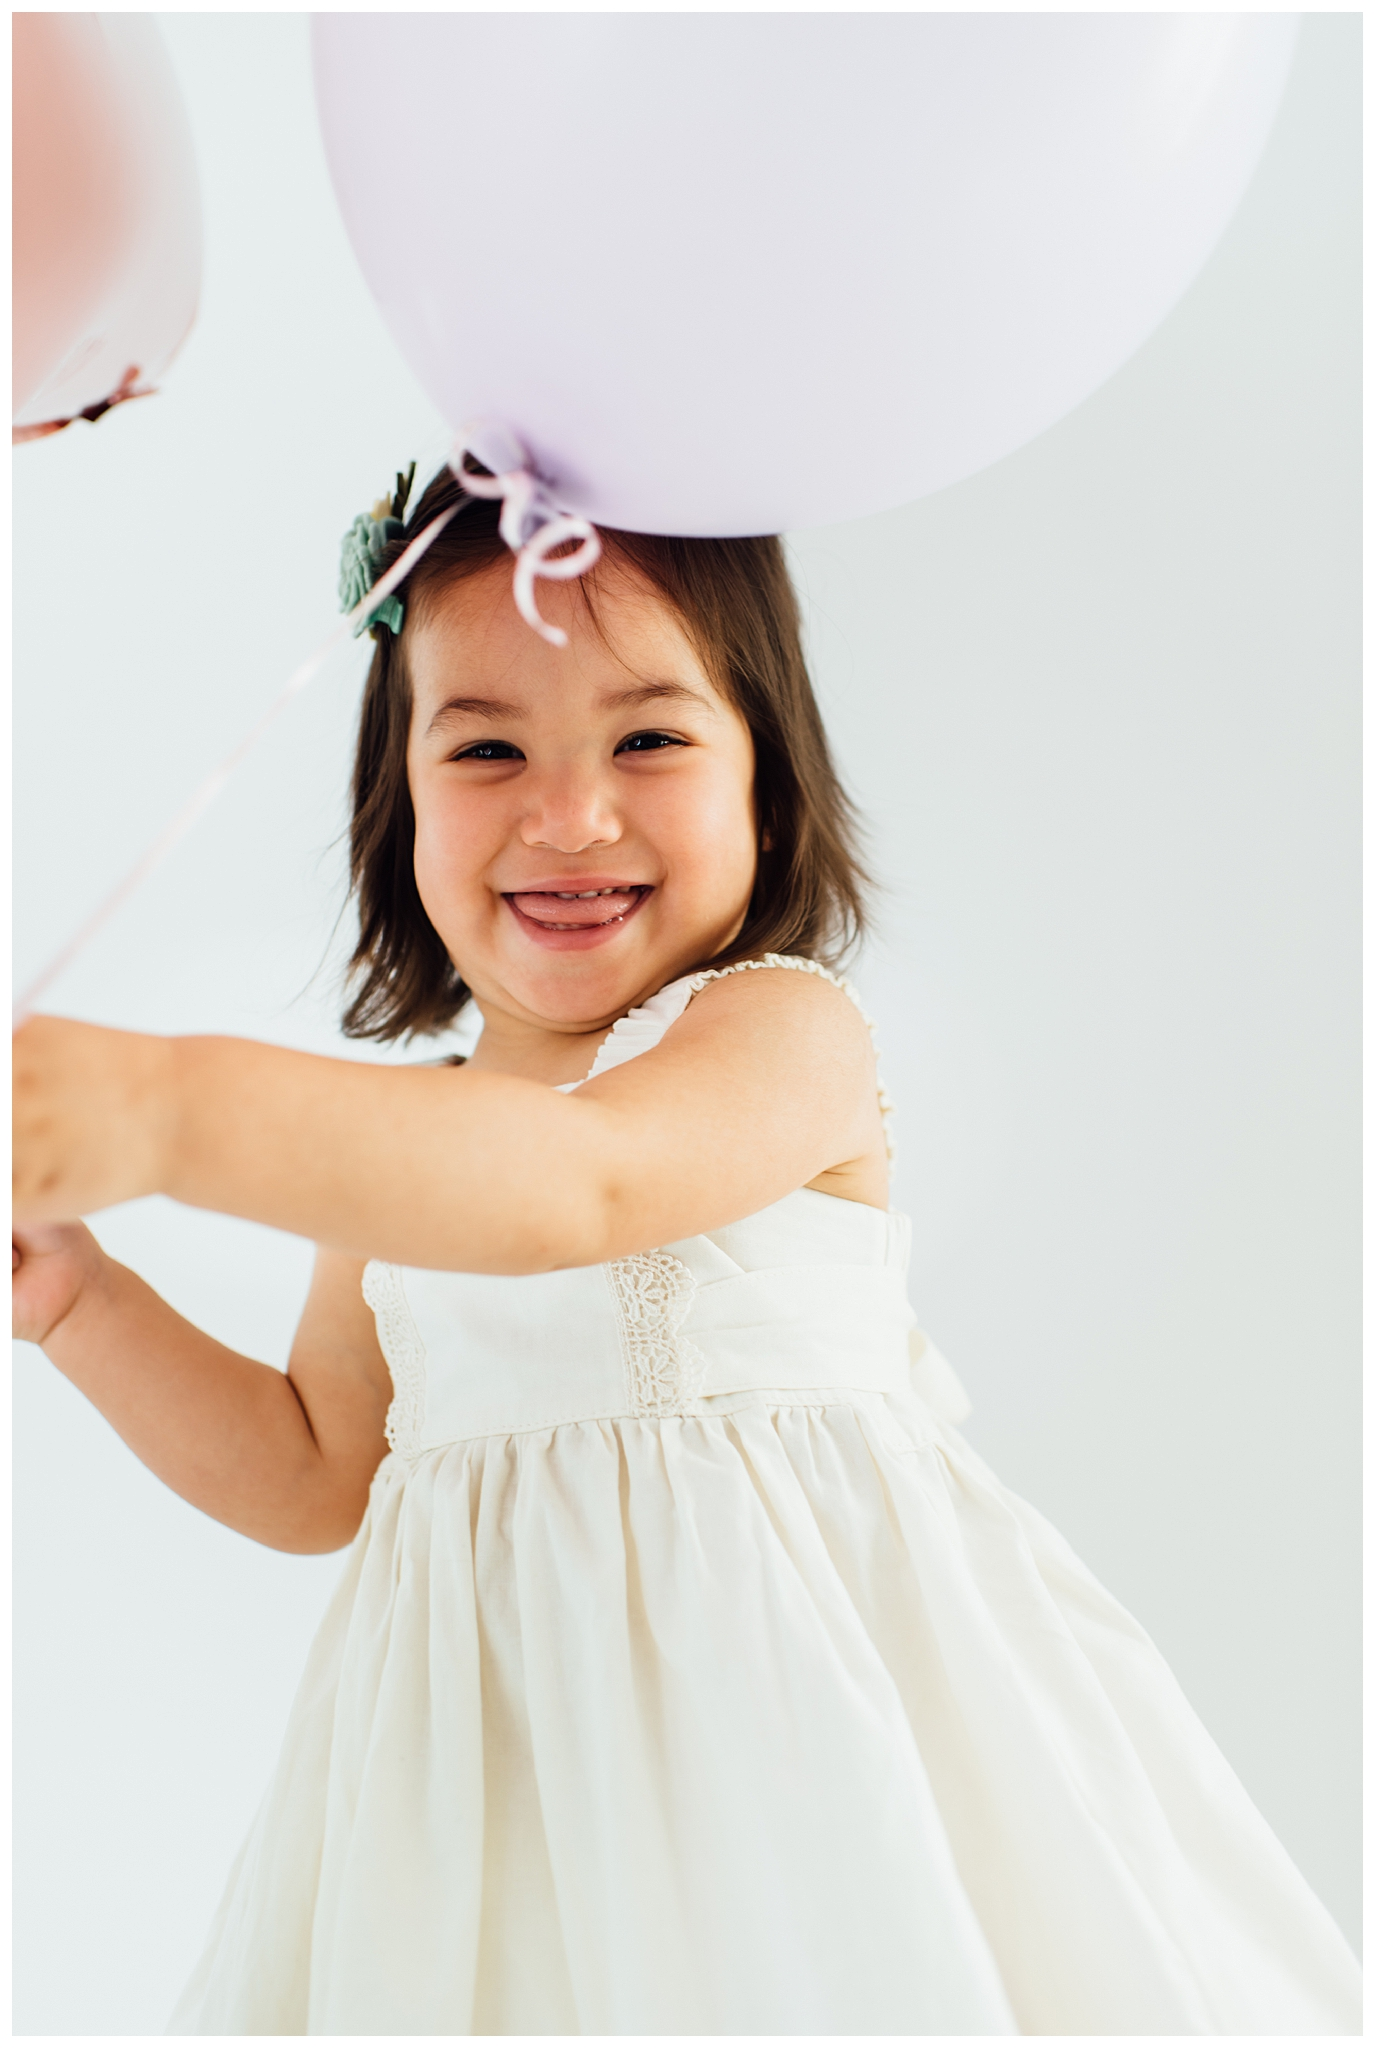 Studio Milestone Portrait Session | Phoenix Child + Baby Photographer_0001.jpg